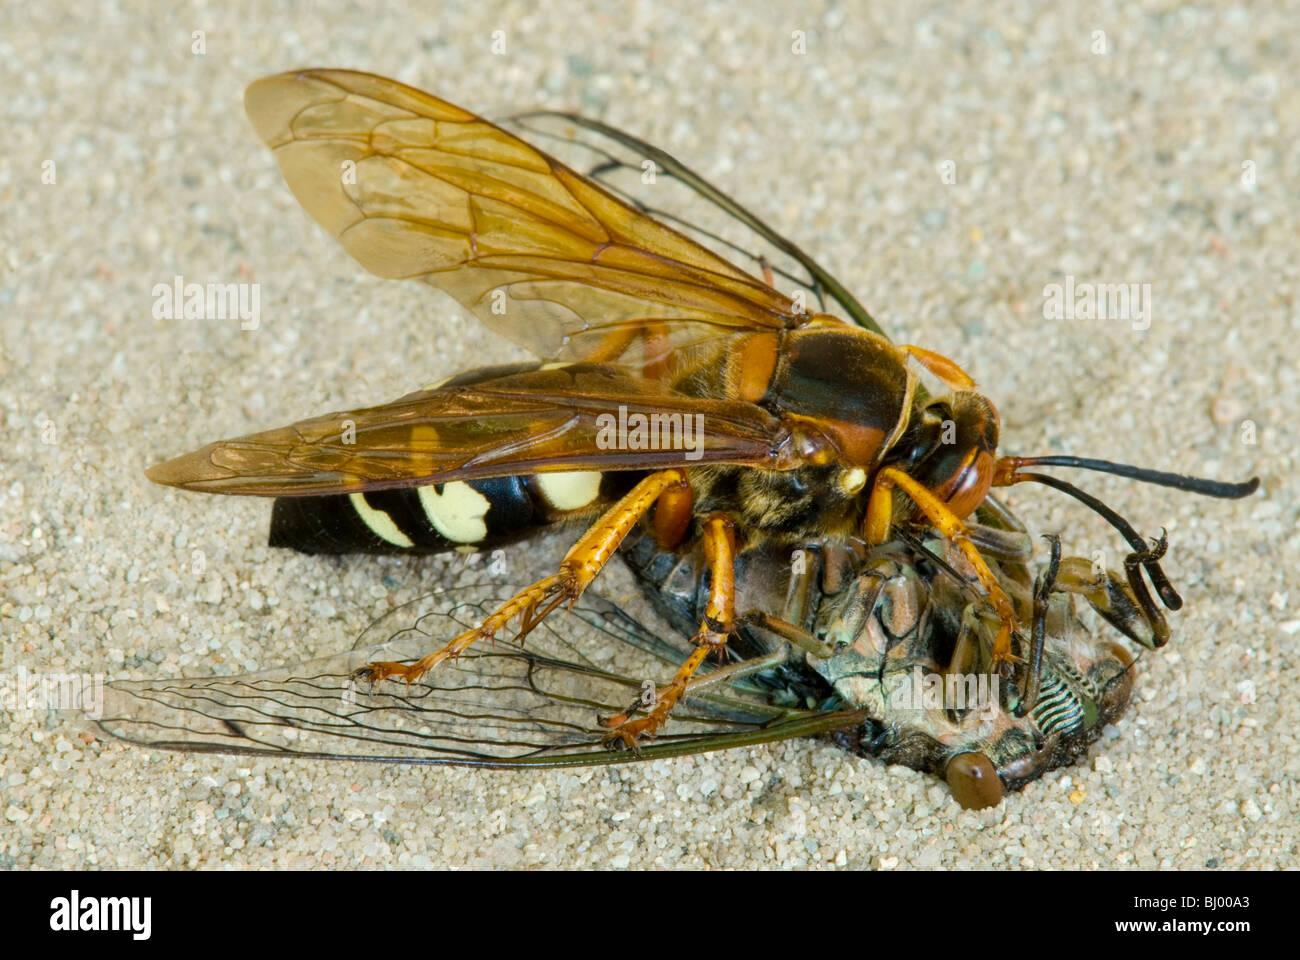 Cicada Killer Sphecius killing Cicada Eastern USA - Stock Image